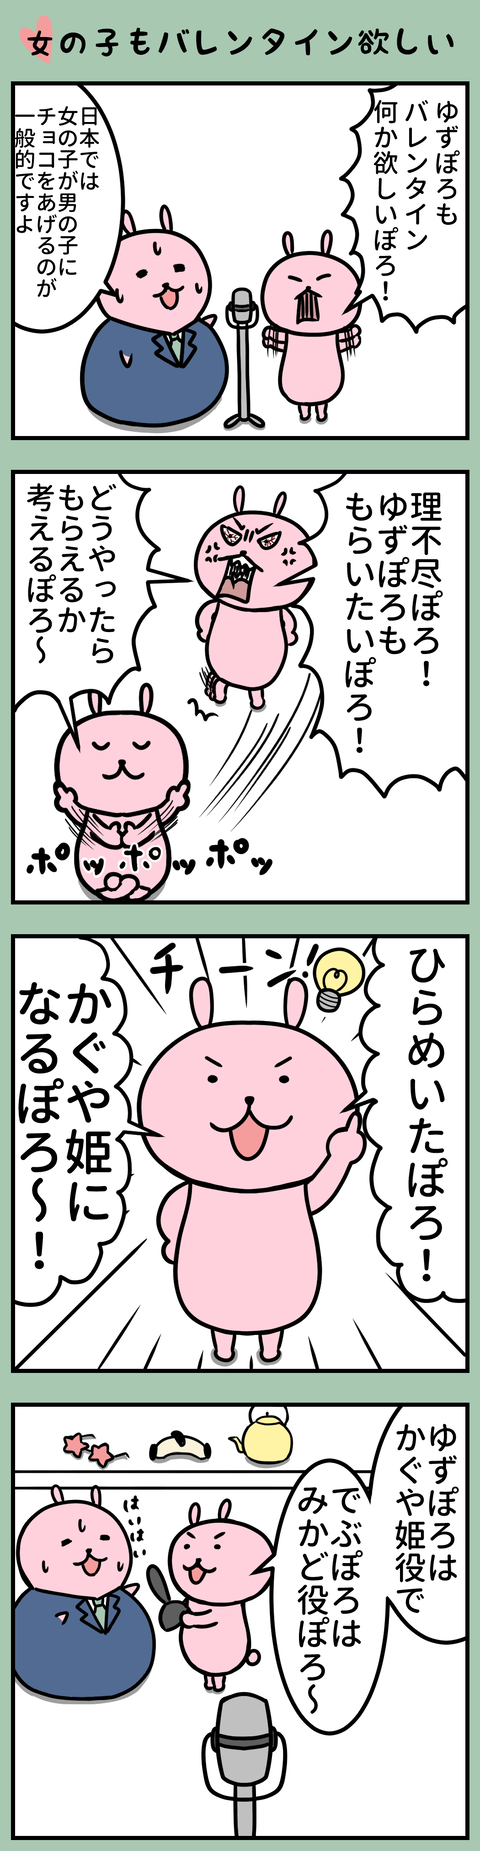 manga-yuzuporo93-1